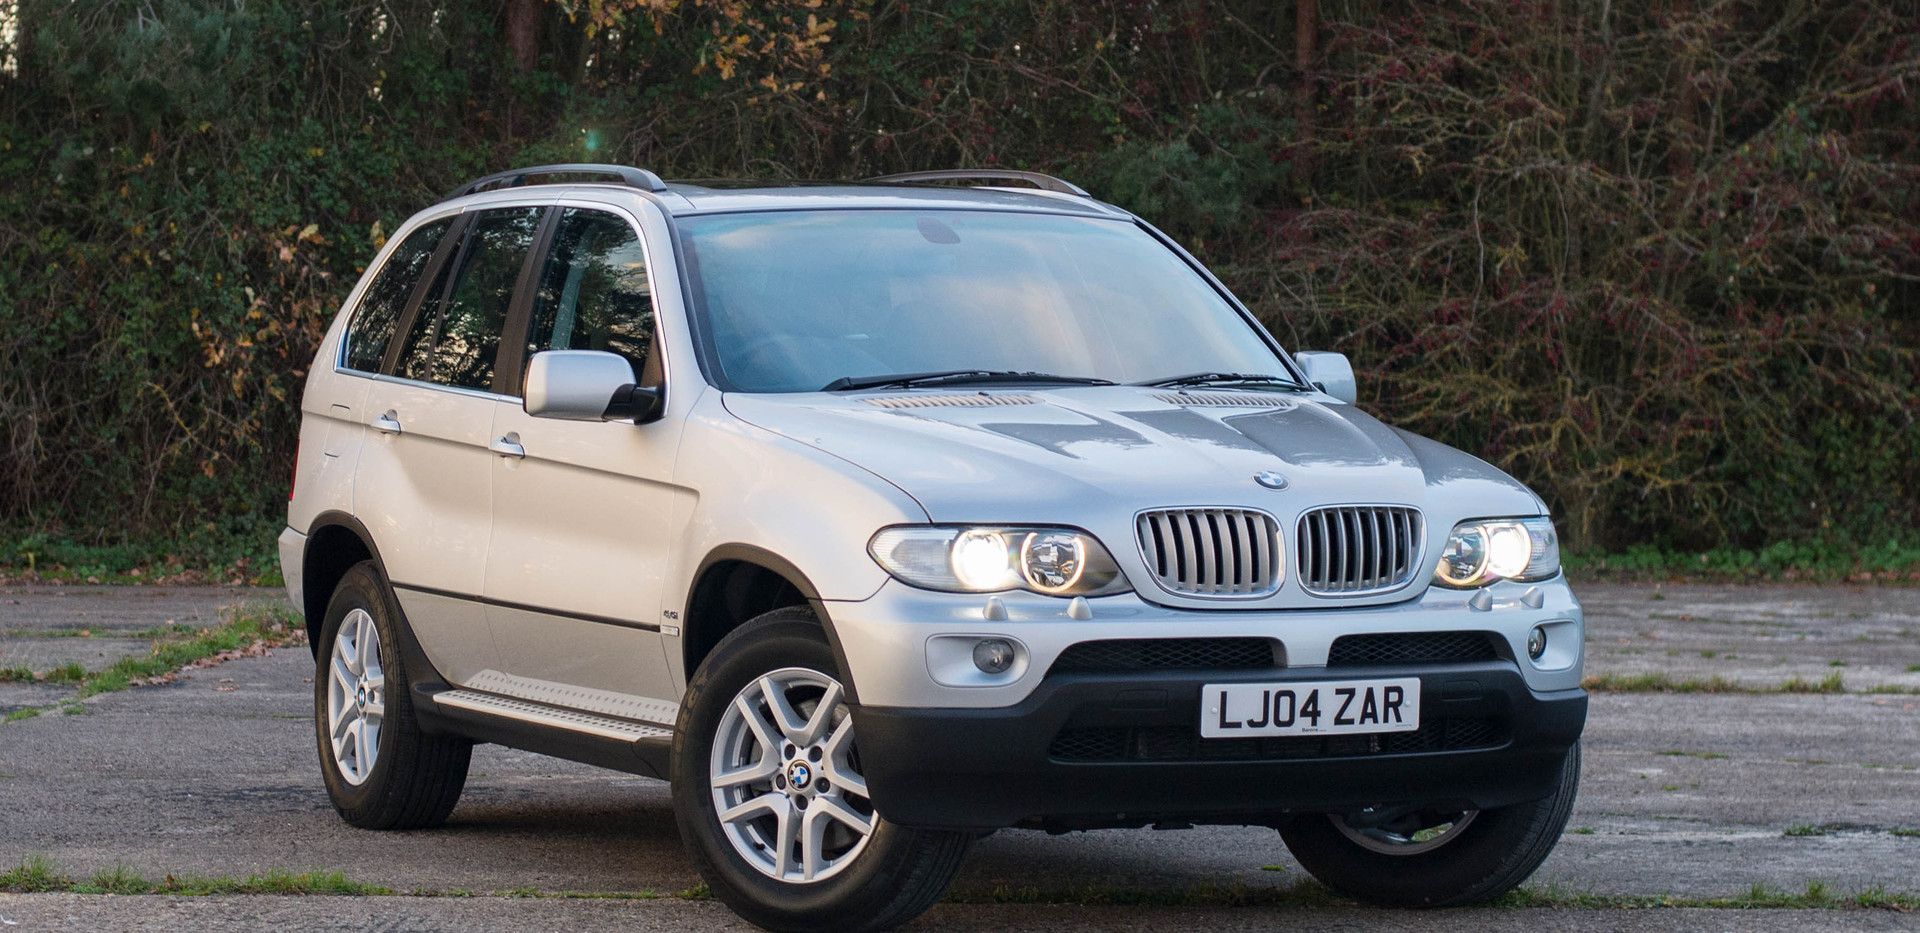 BMW E53 X5 4.4i For Sale UK London  (39